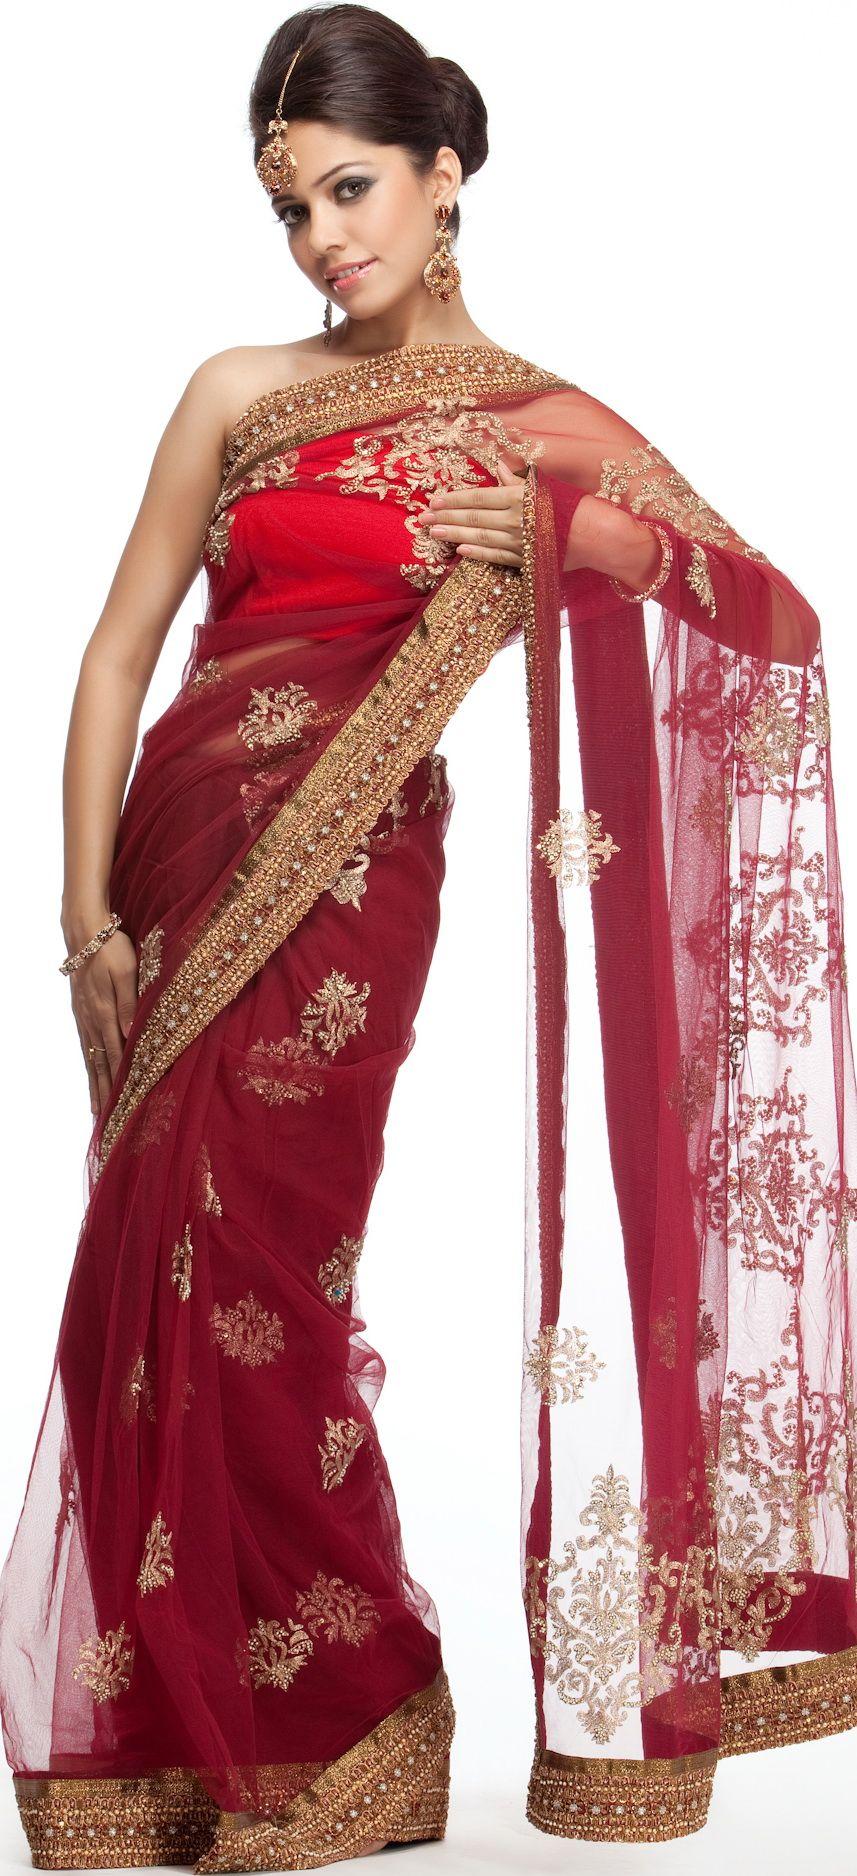 Fashion with Saris in 2012 | Top 10 Sari Designs